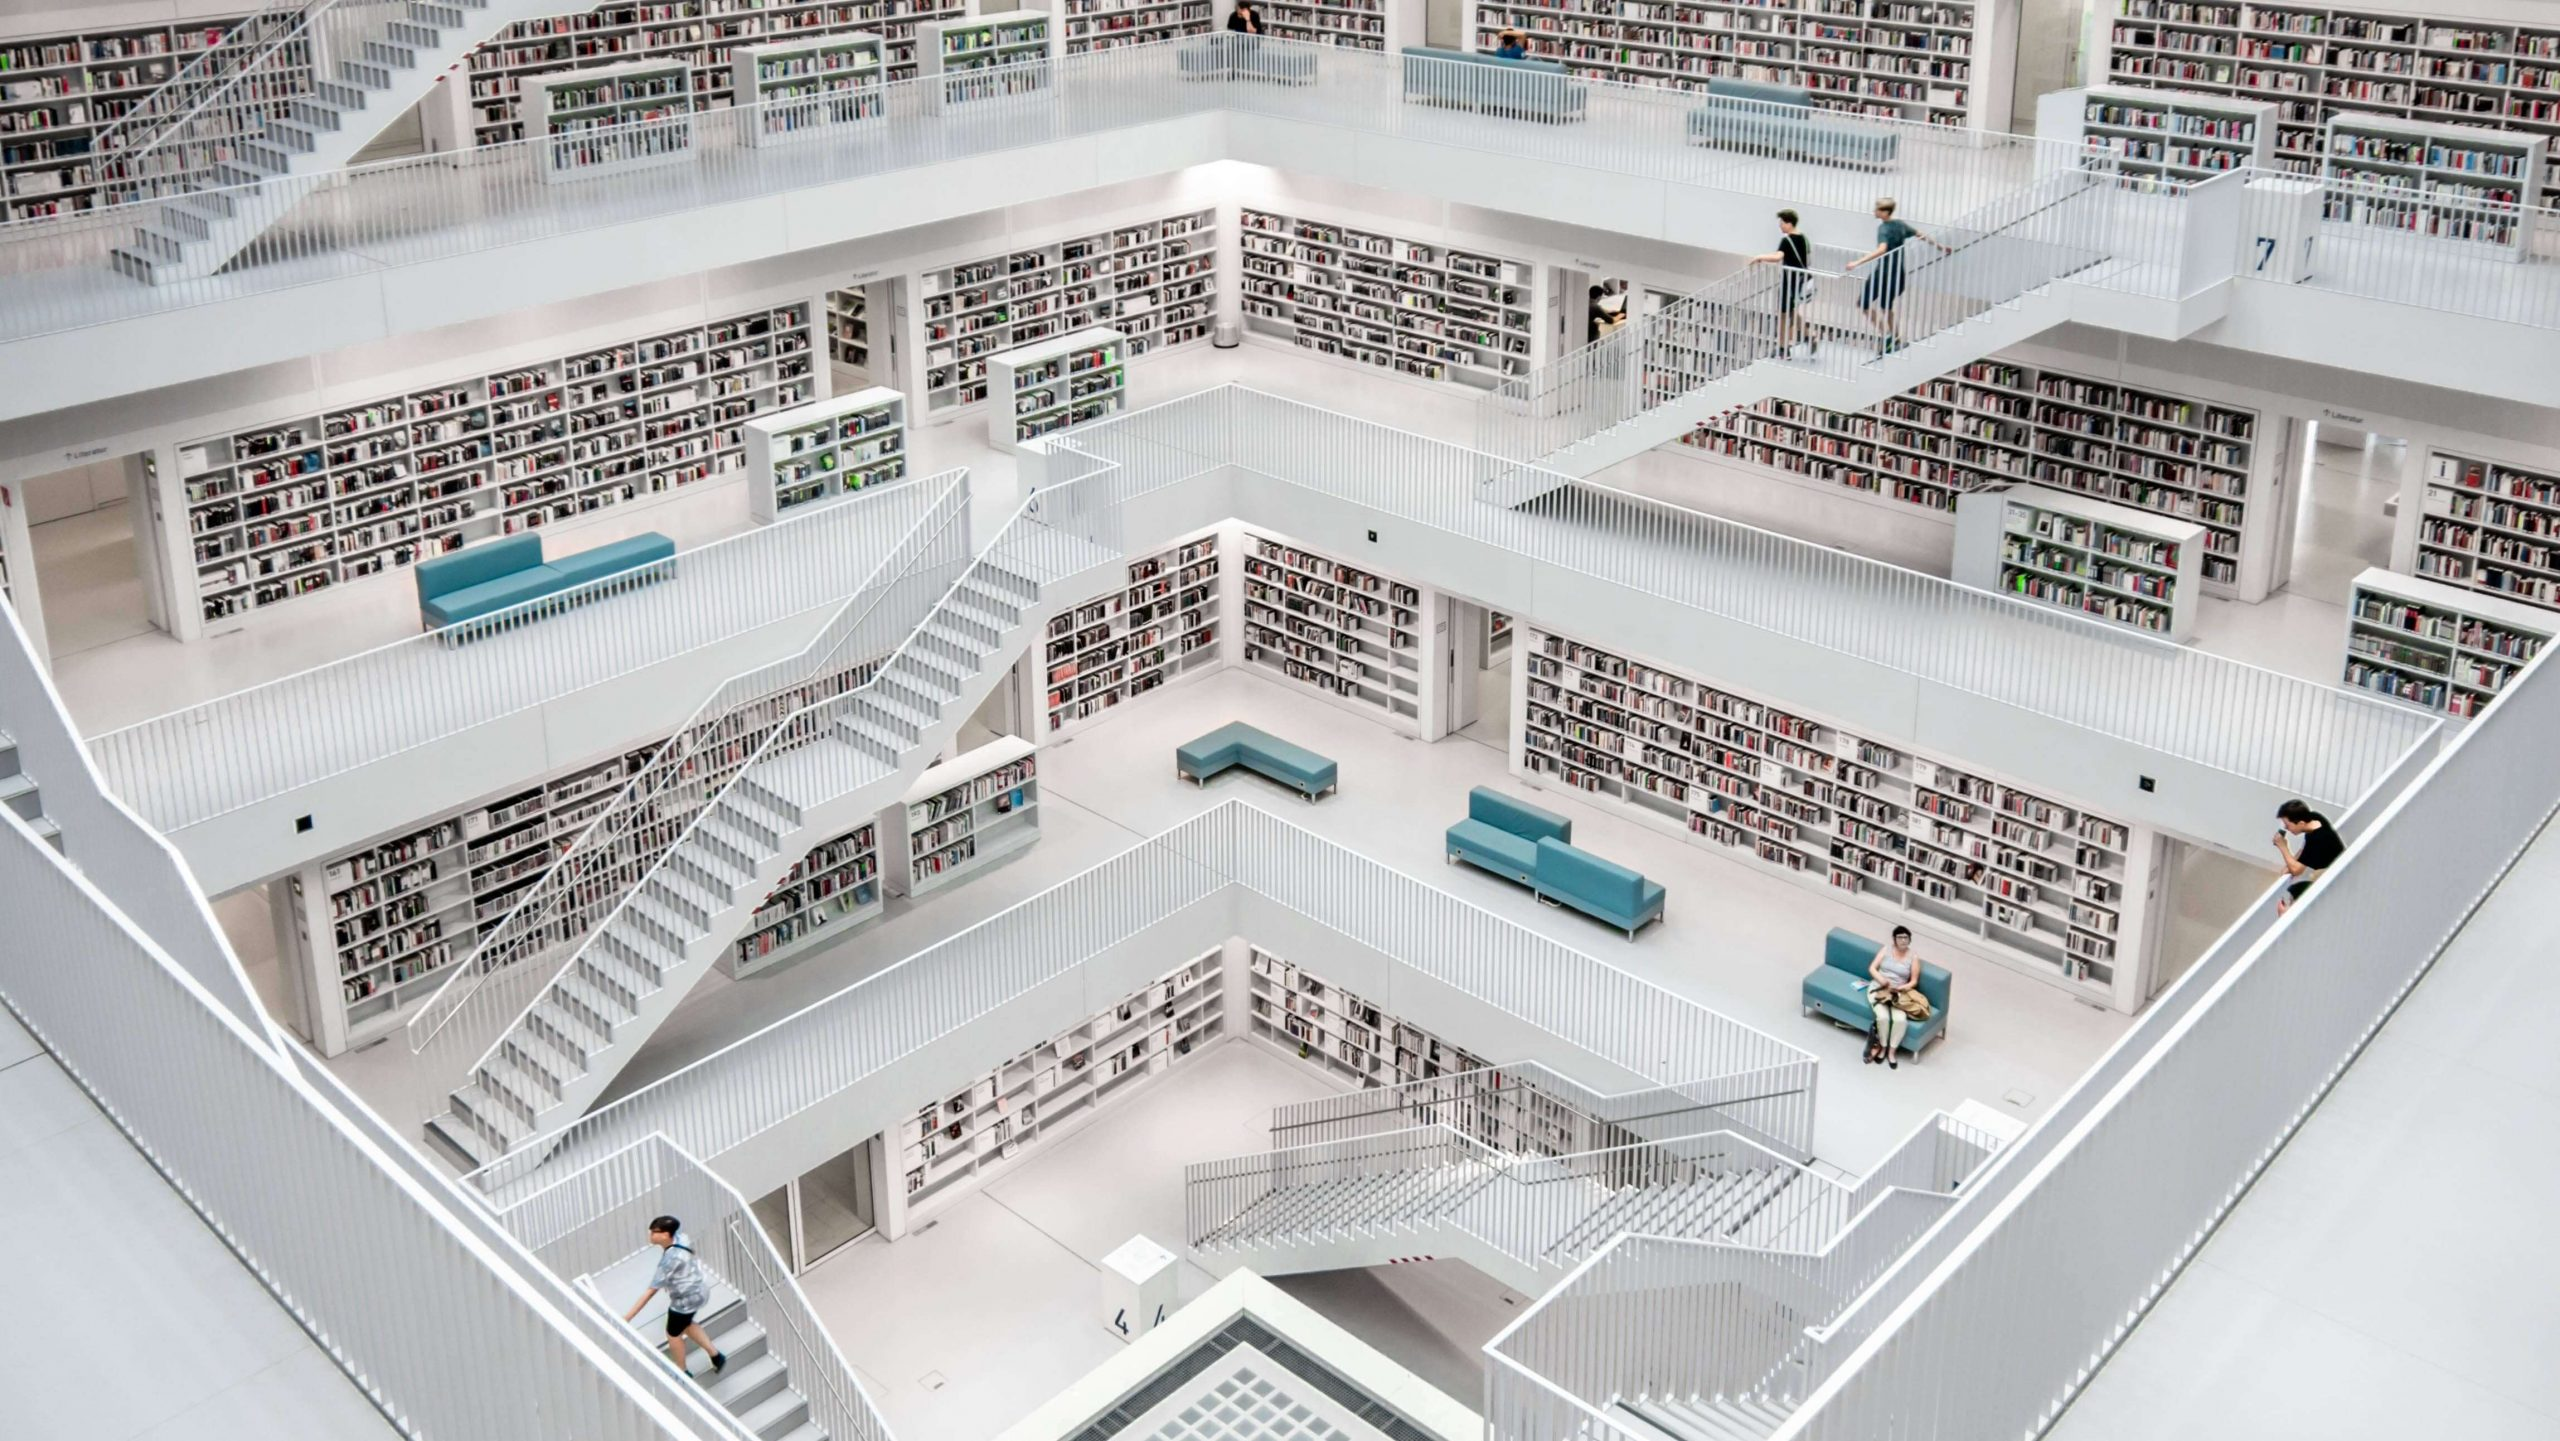 Declarative Knowledge Overload